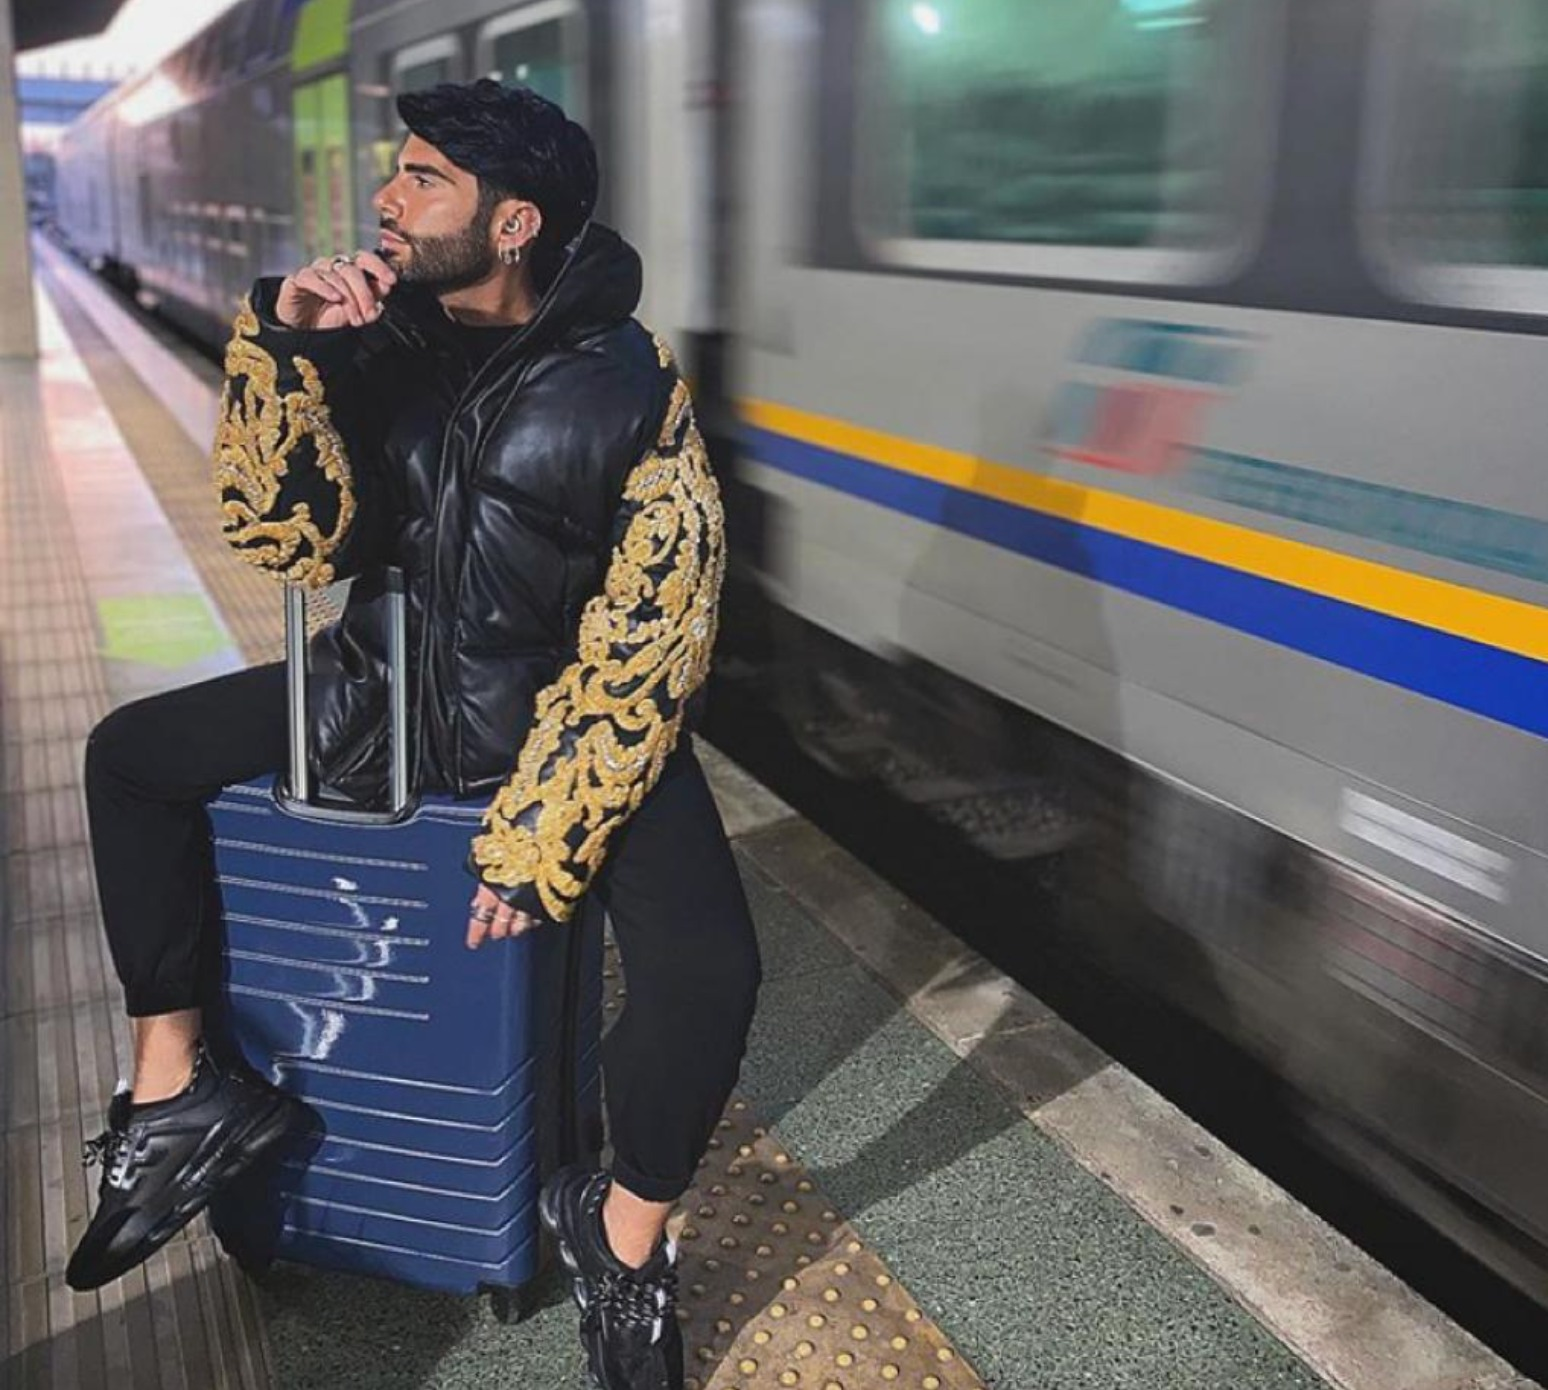 federico fashion style instagram polemica ricchezza soldi